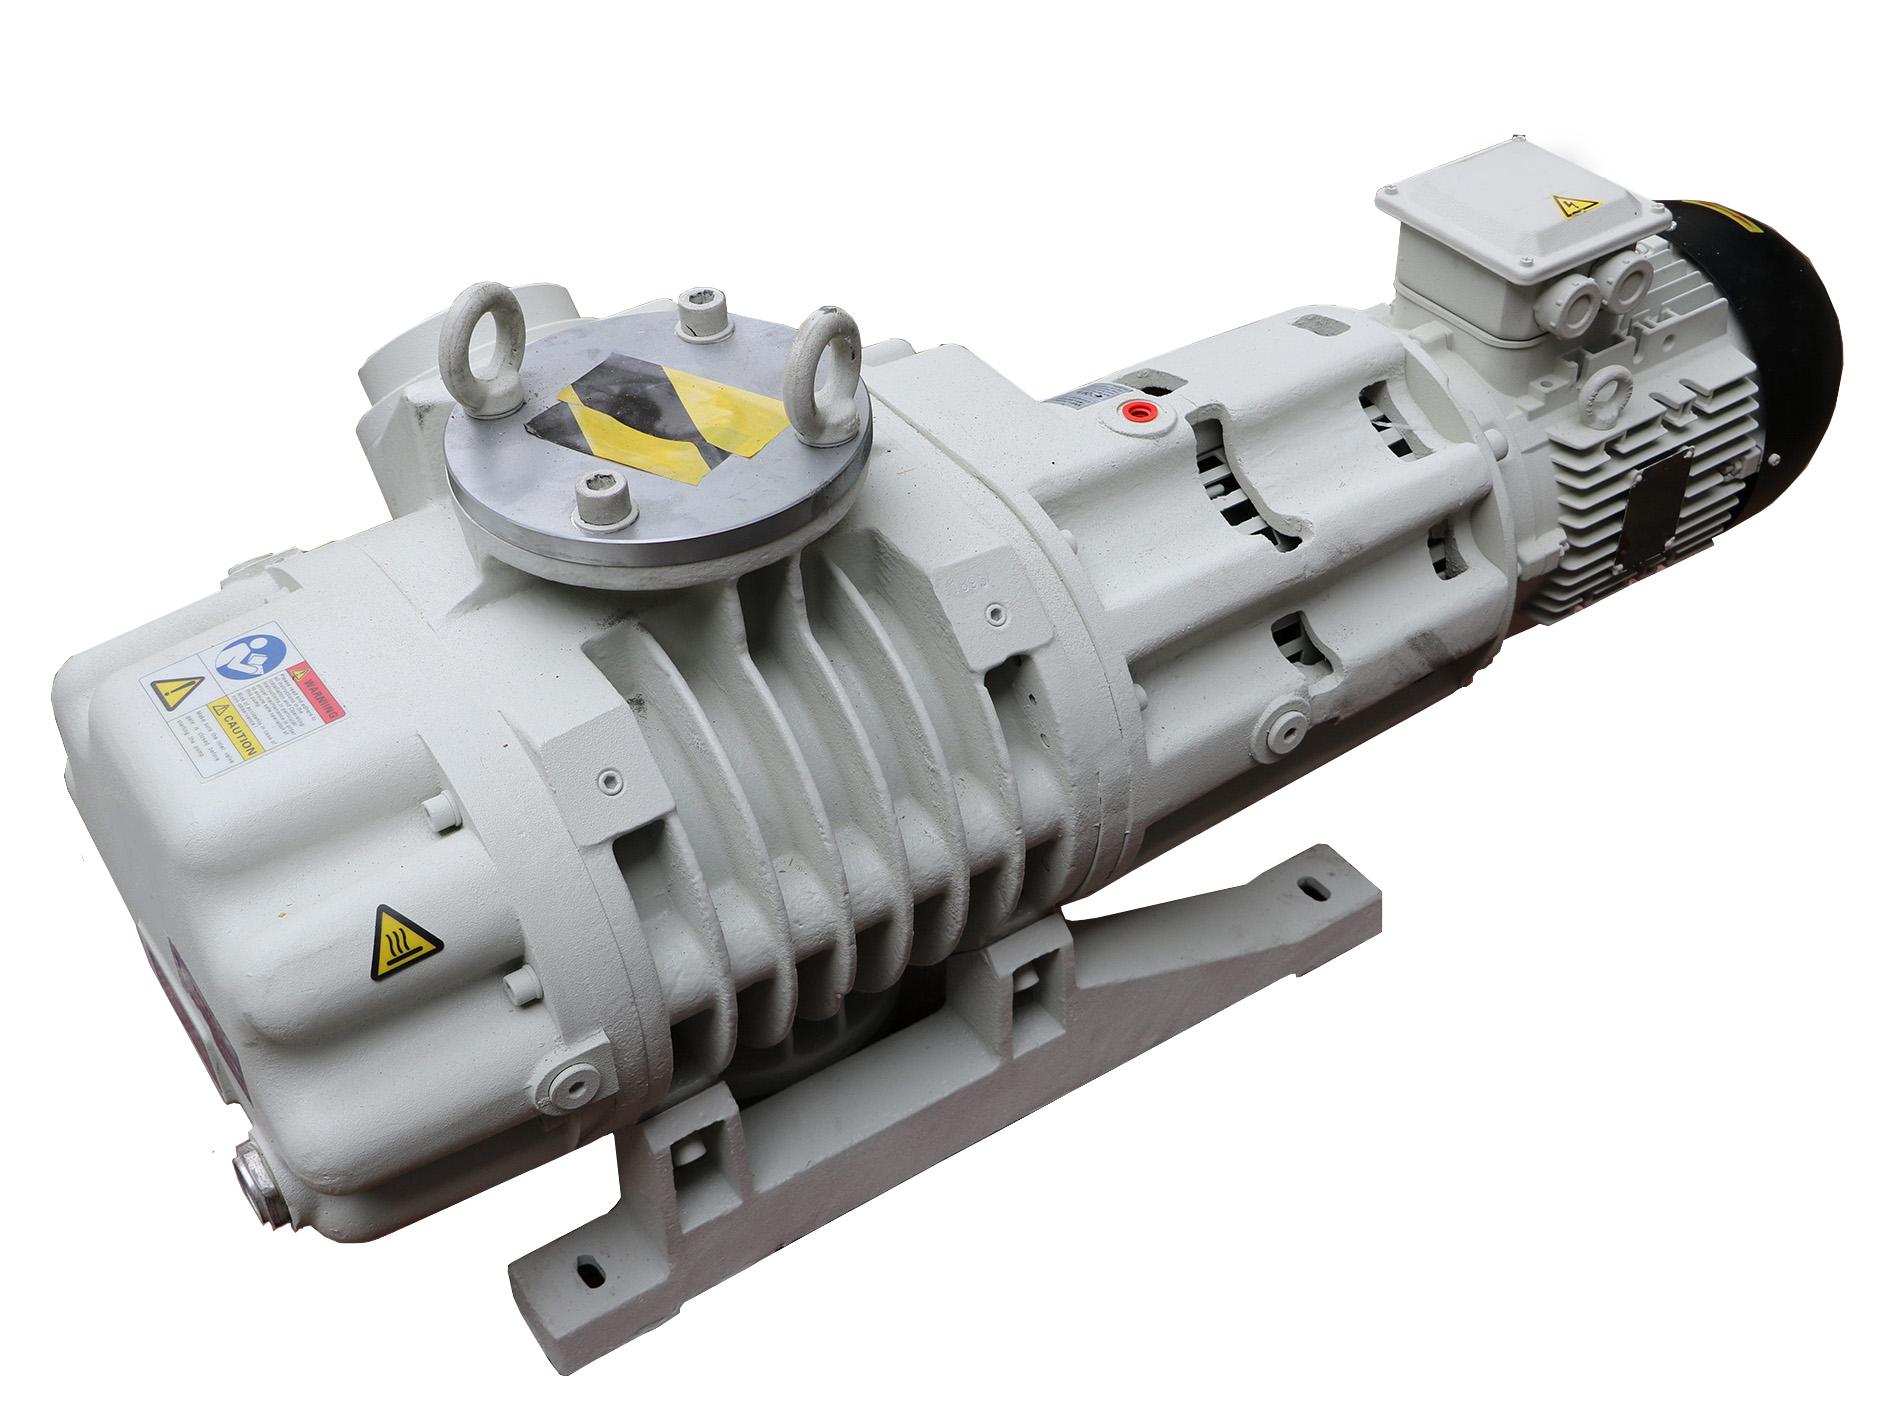 VJP-1000罗茨真空泵